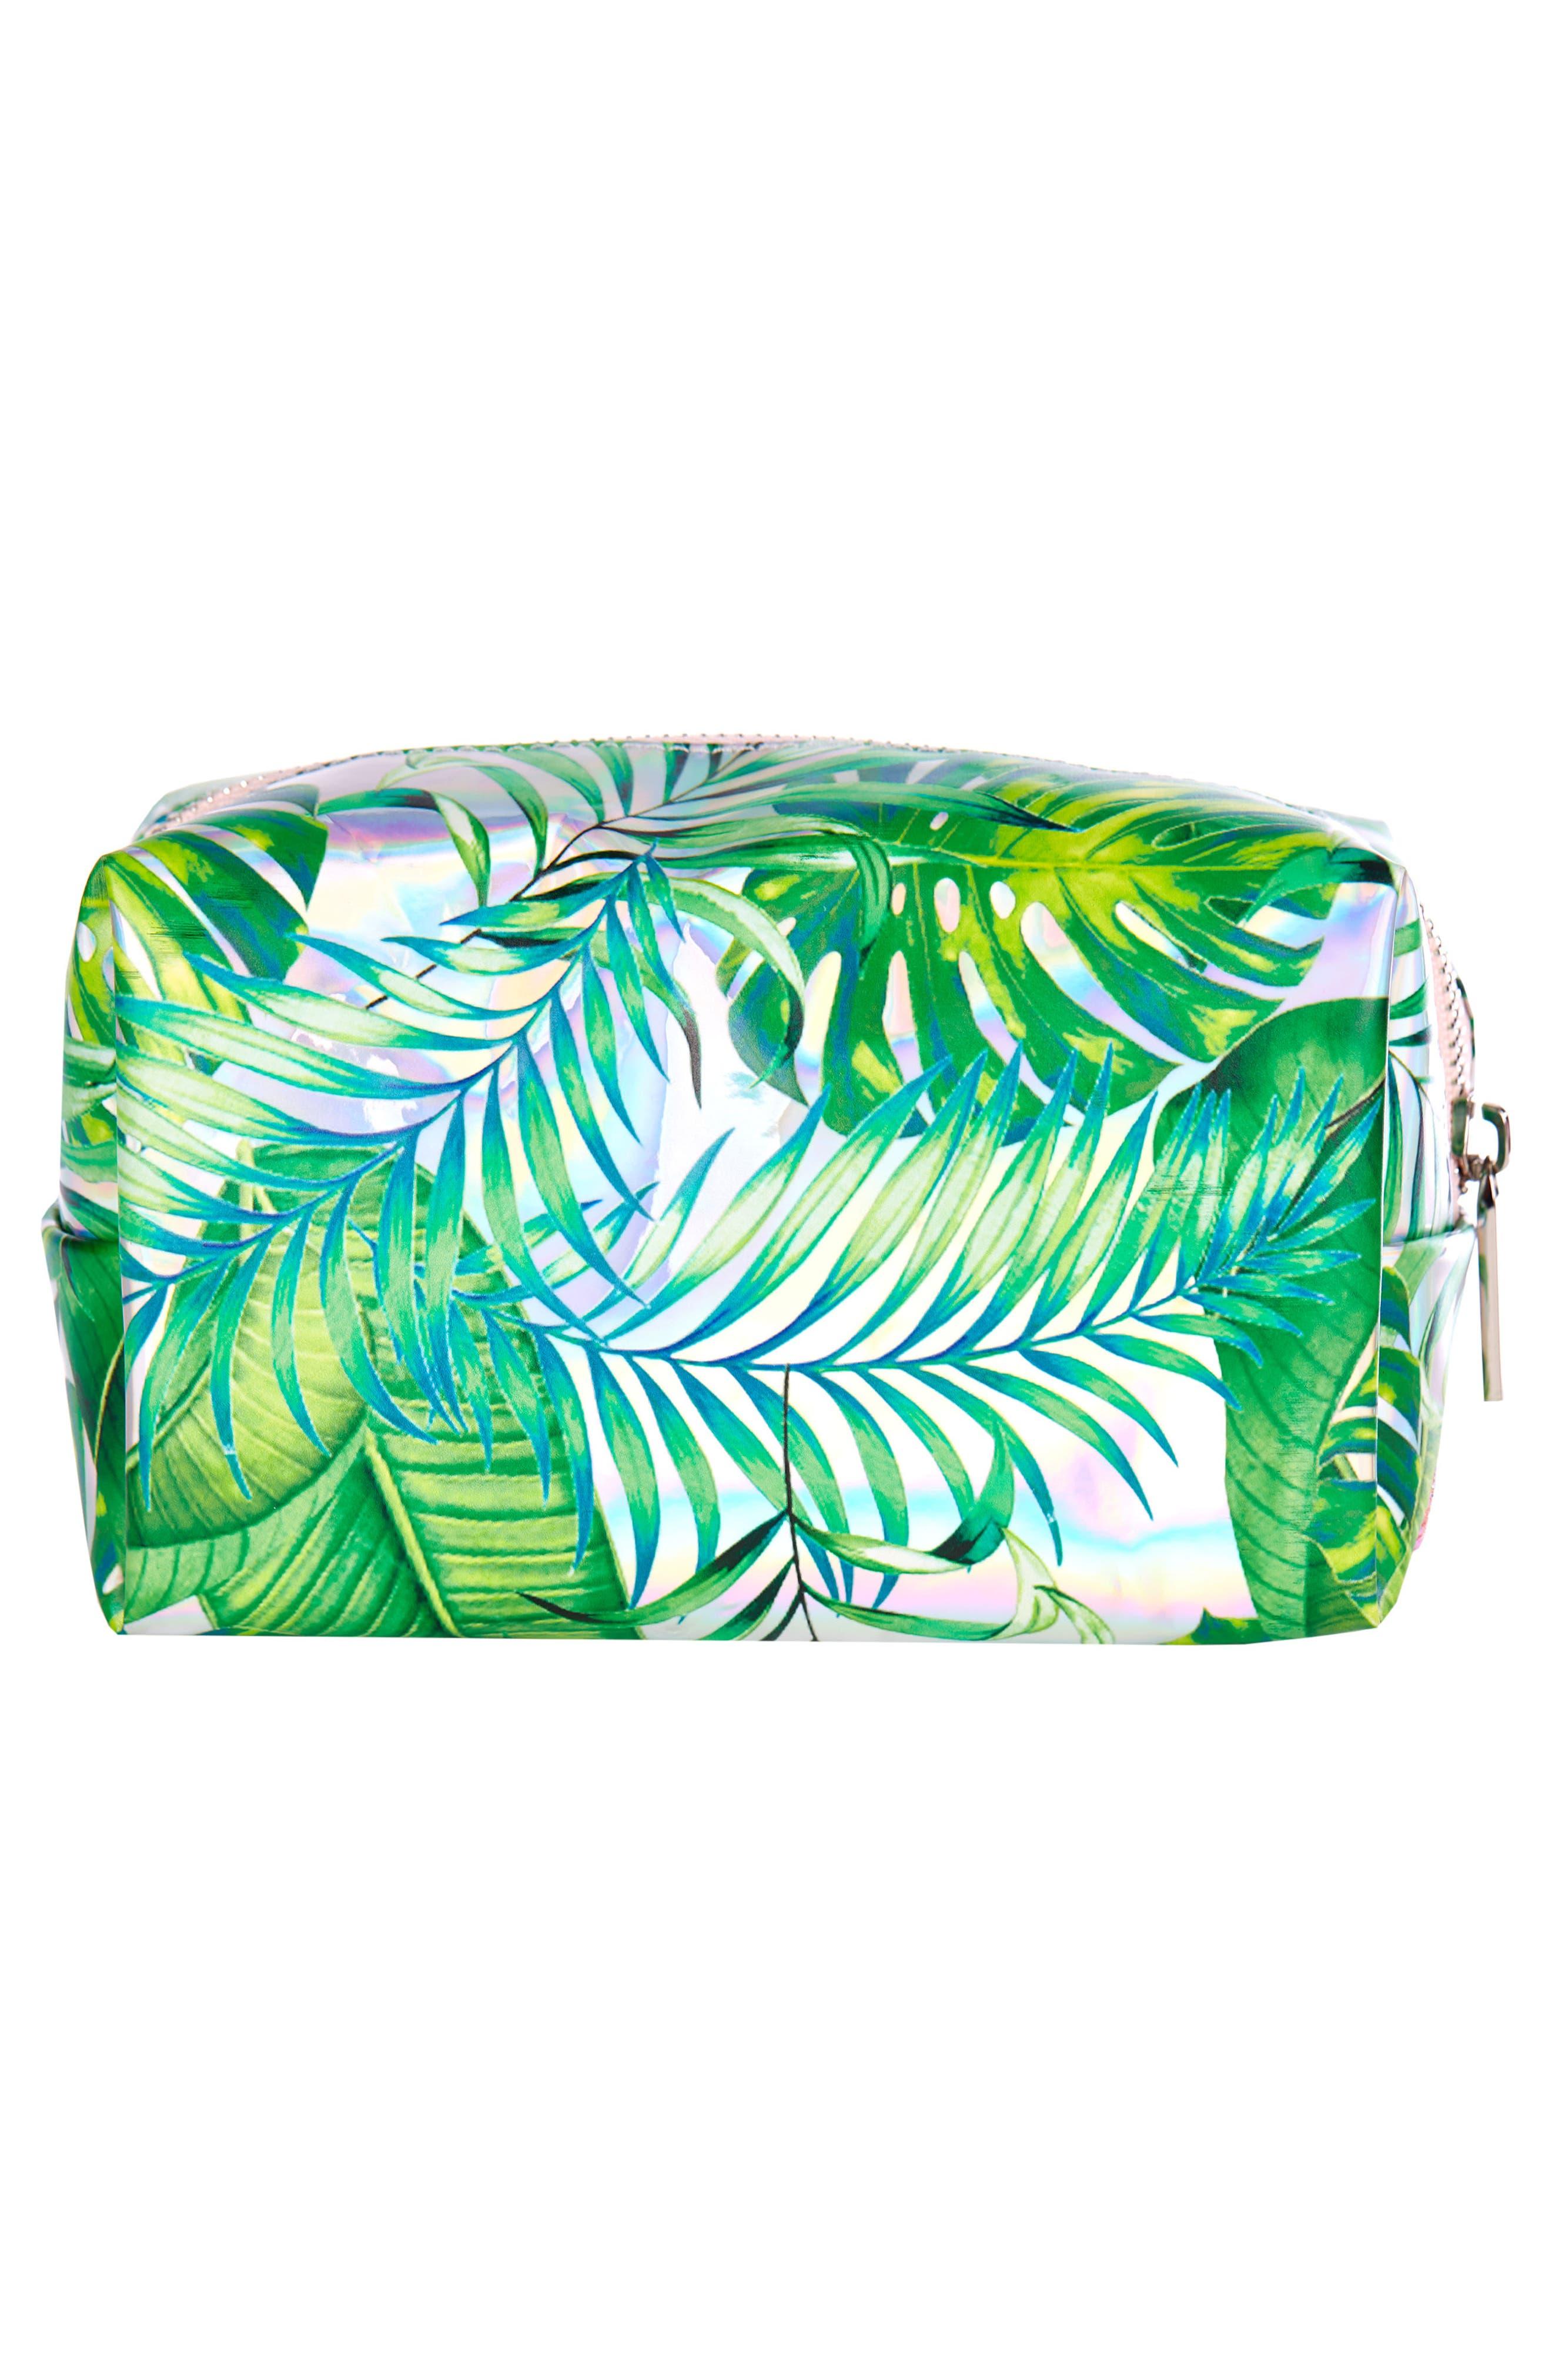 SKINNYDIP,                             Skinny Dip Dominica Cosmetics Case,                             Alternate thumbnail 2, color,                             000